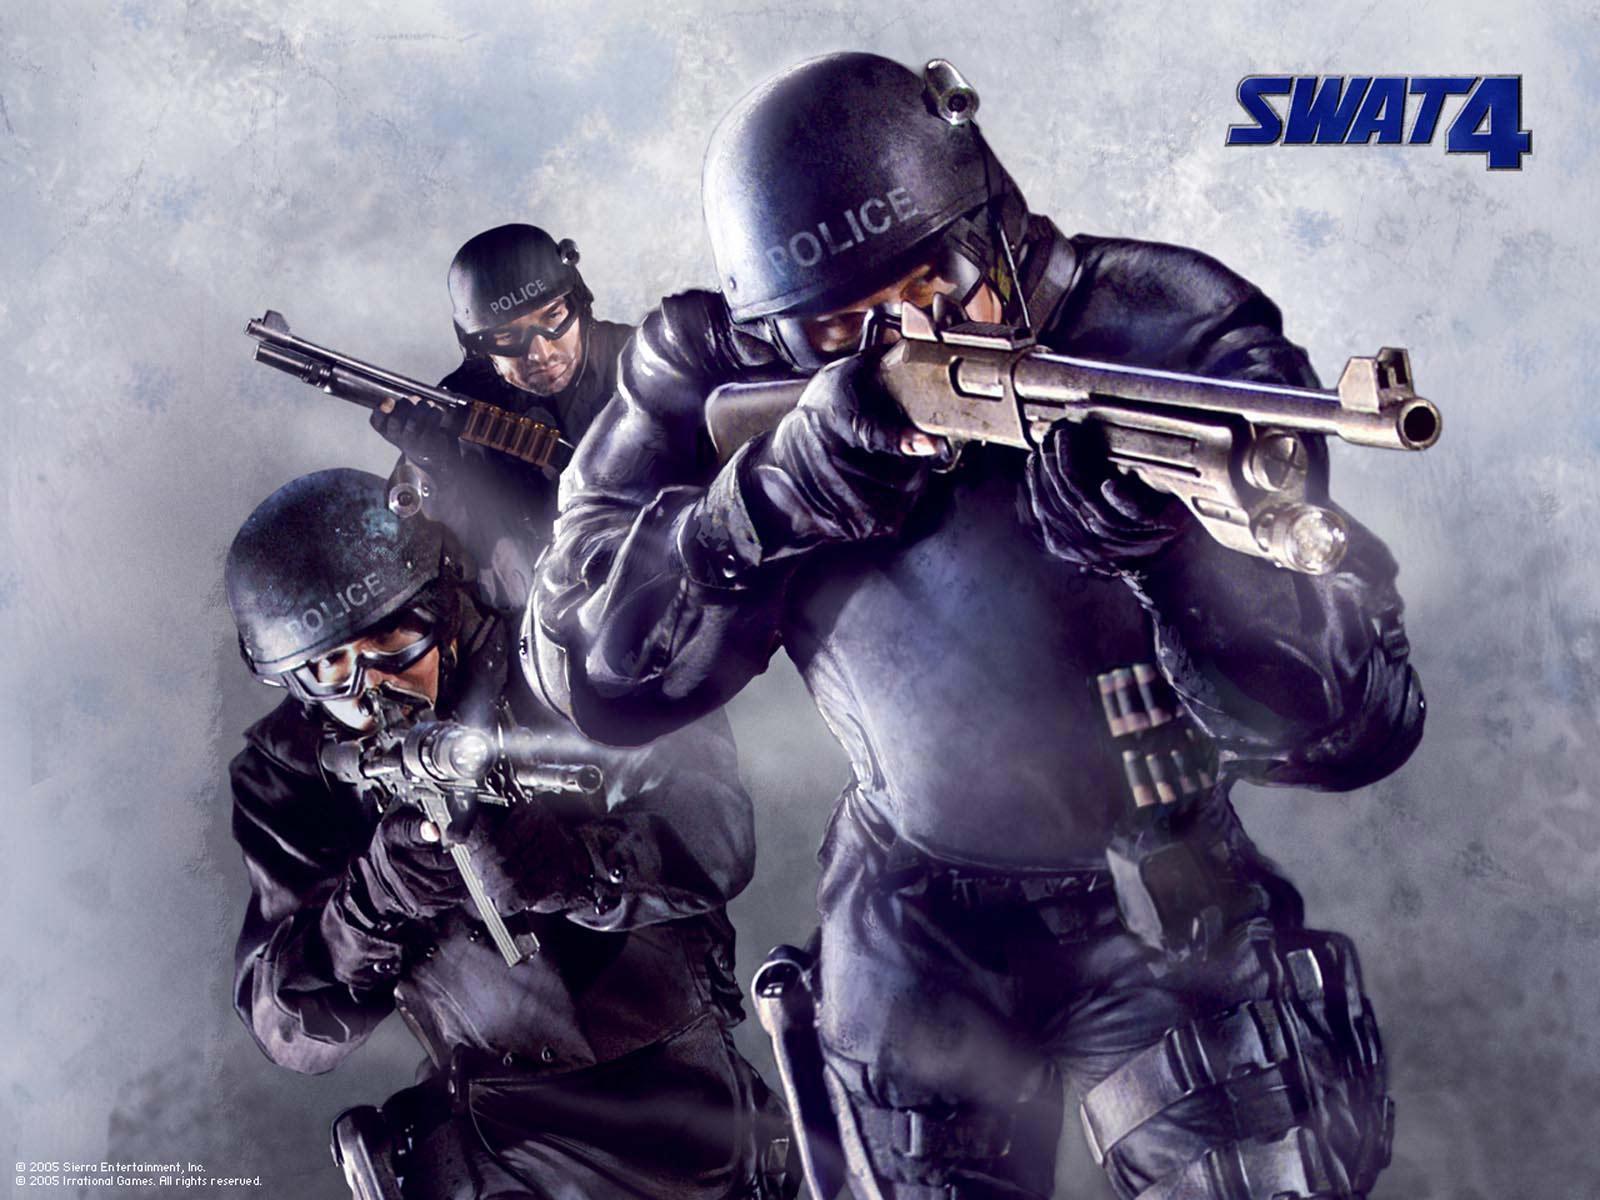 http://gam3rha.persiangig.com/image/SWAT/Swat_4.jpg